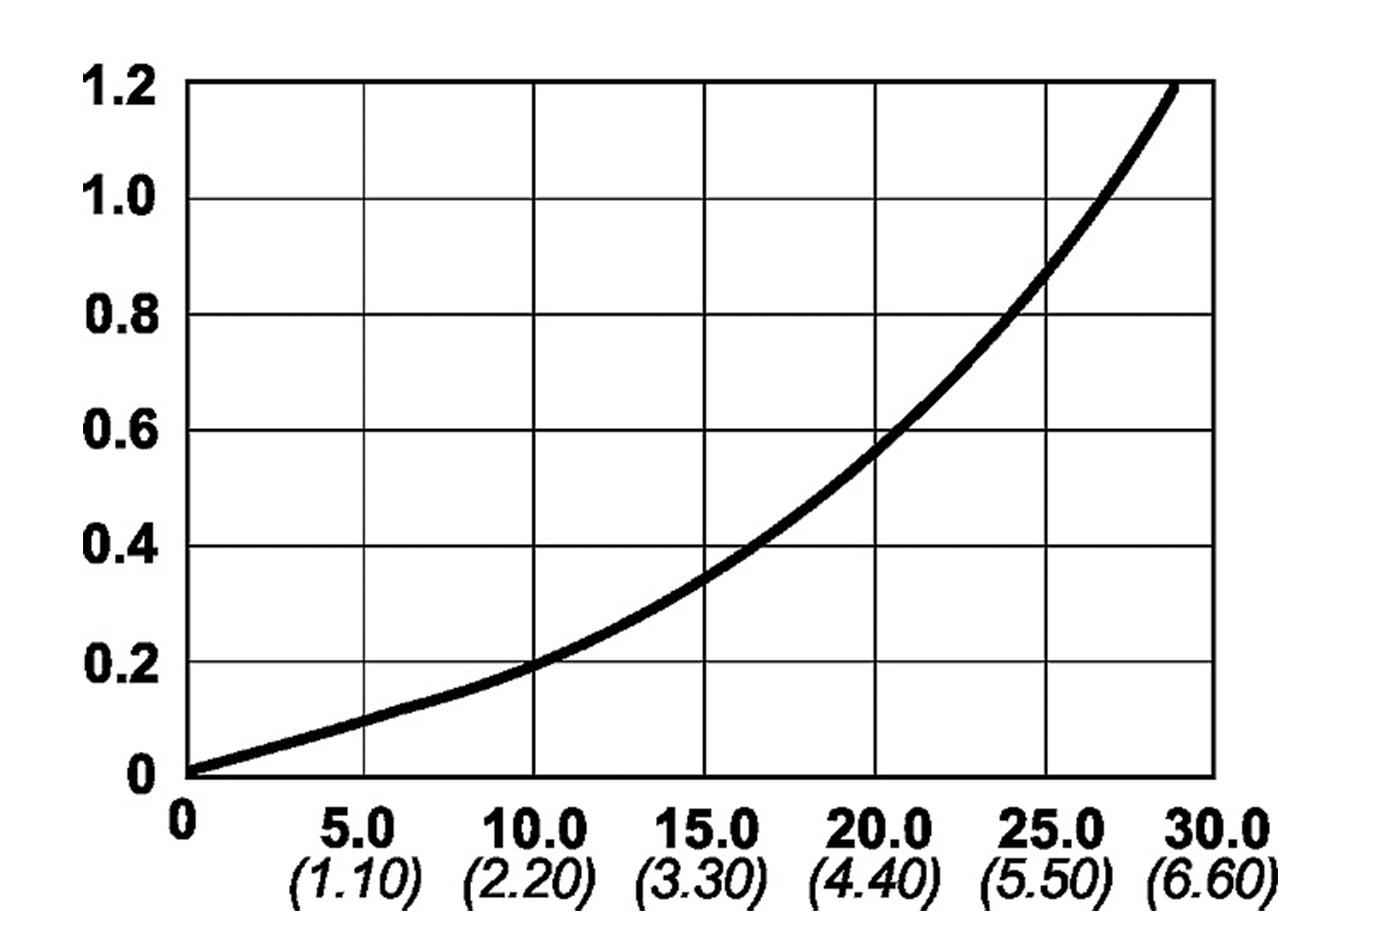 Cejn 232 Serisi Hidrolik Vidalı Kaplinler [700 Bar]